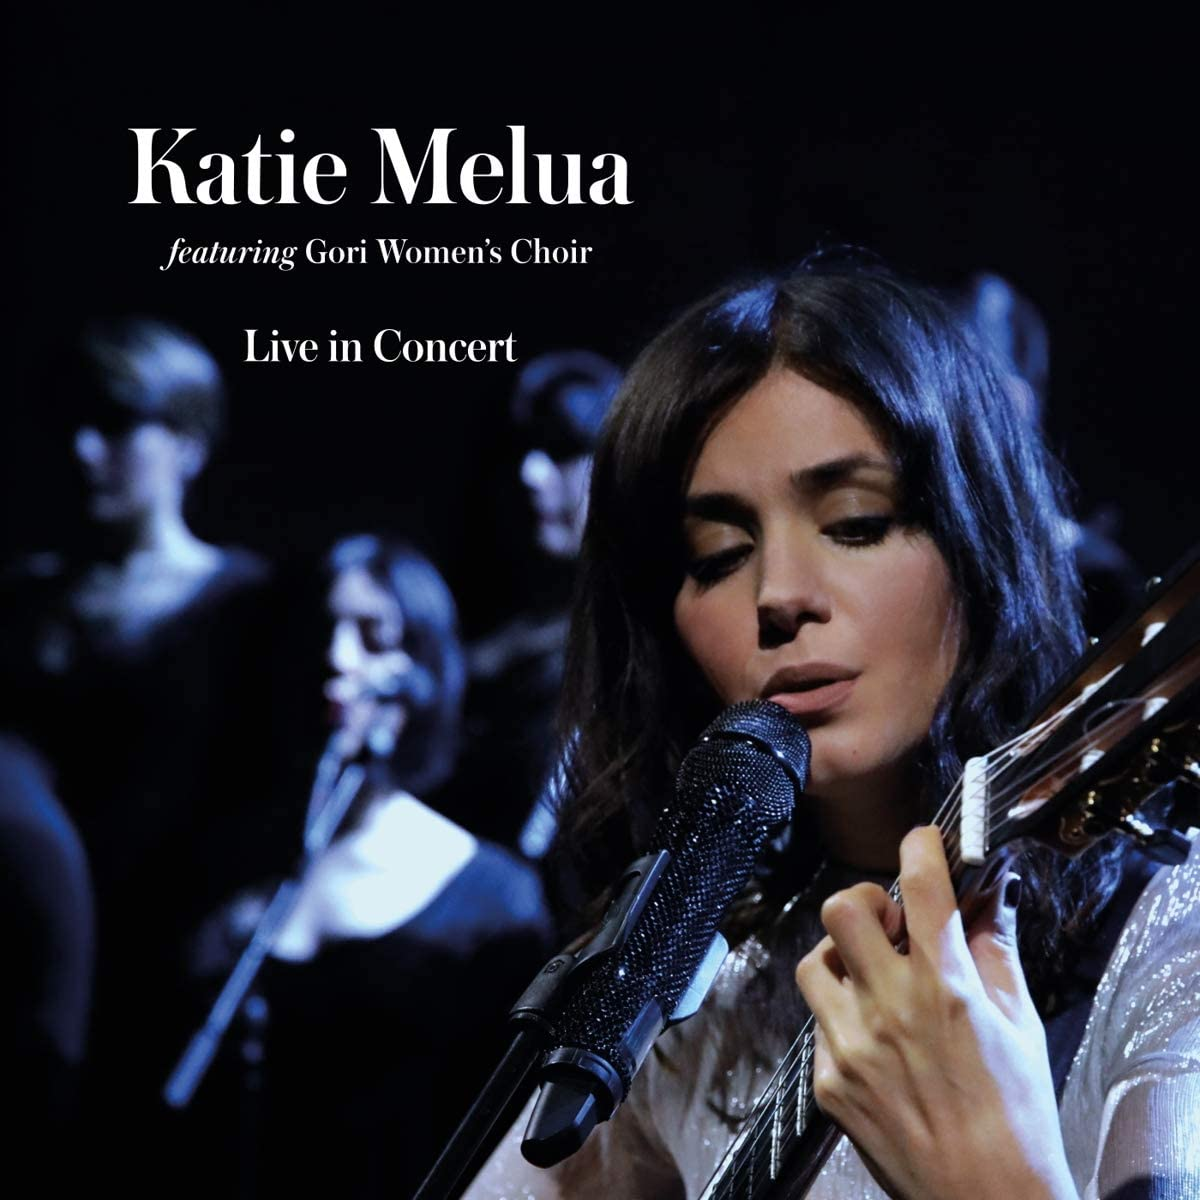 Katie Melua - CD FEATURING. GORI WOMEN'S CHOIR - LIVE IN CONCERT